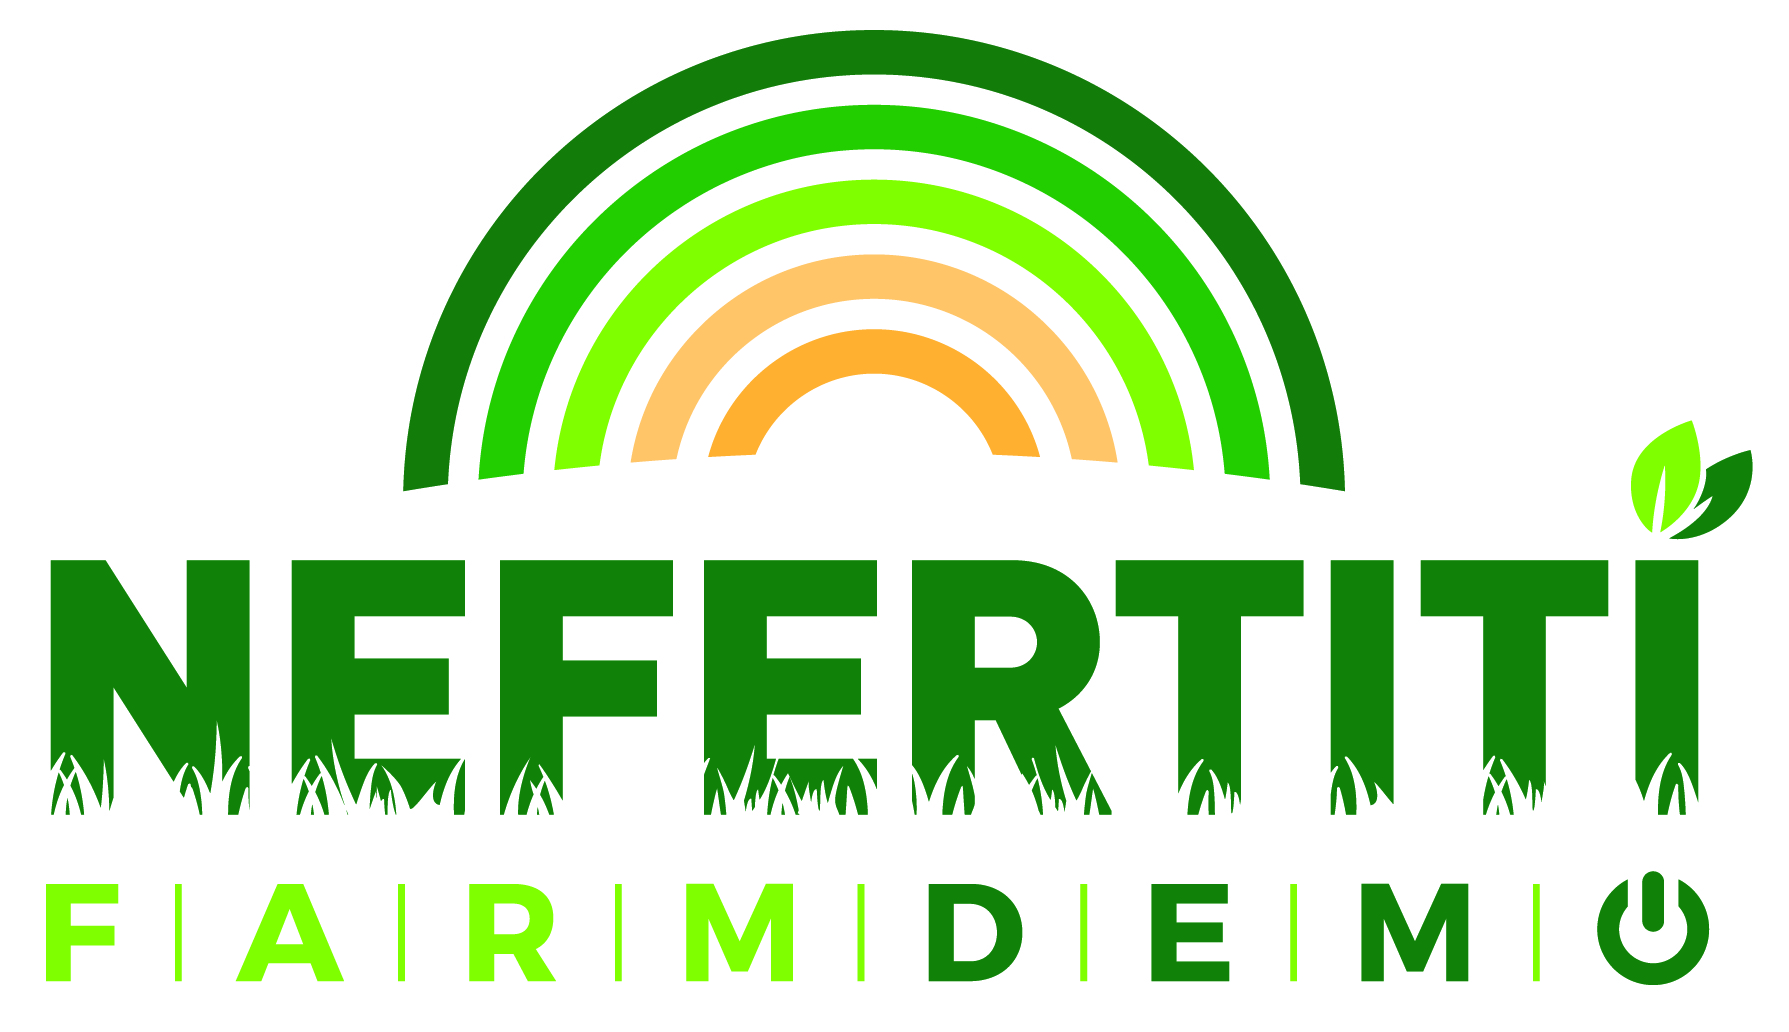 Horizon2020 project NEFERTITI: farmer-to-farmer learning in whole Europe